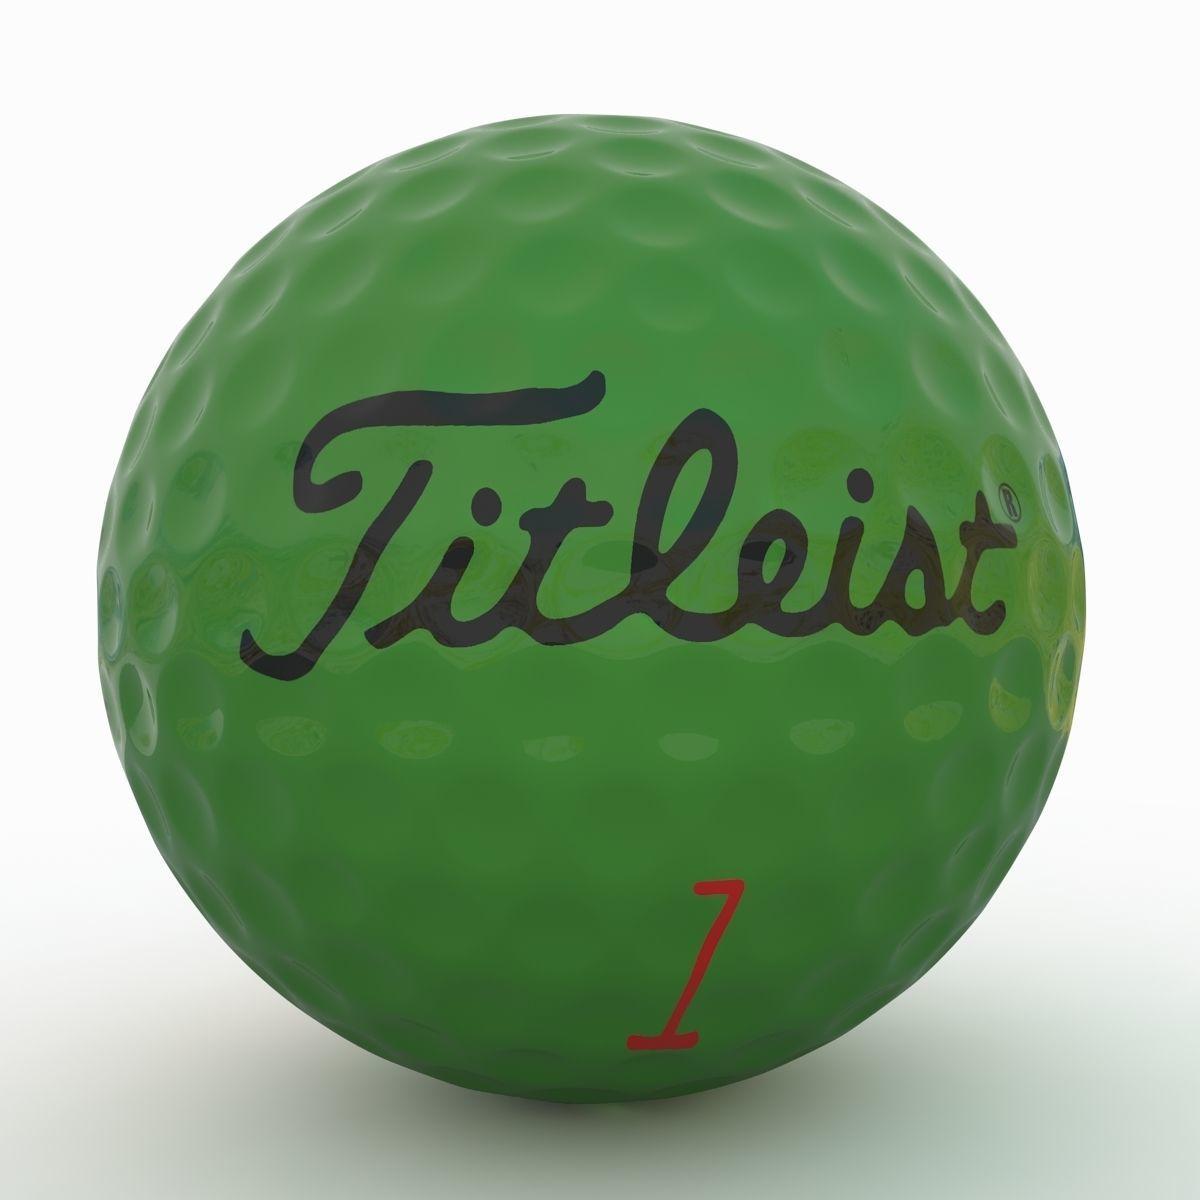 Gilf Ball Green